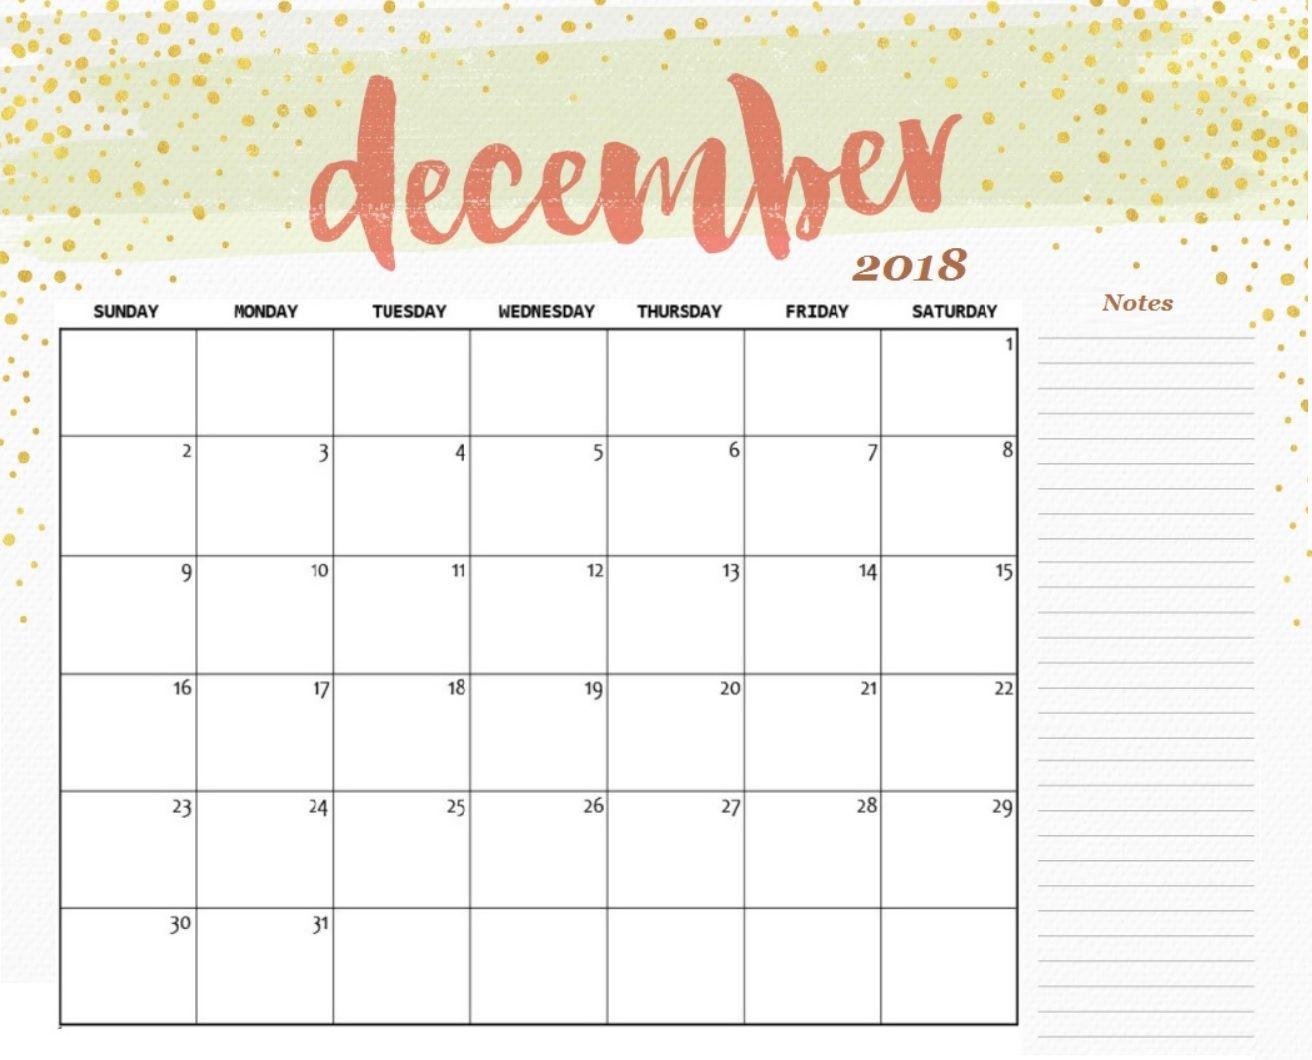 December 2018 Calendar Printable Template | 100+ December 2018 regarding Blank December Calendar Printable